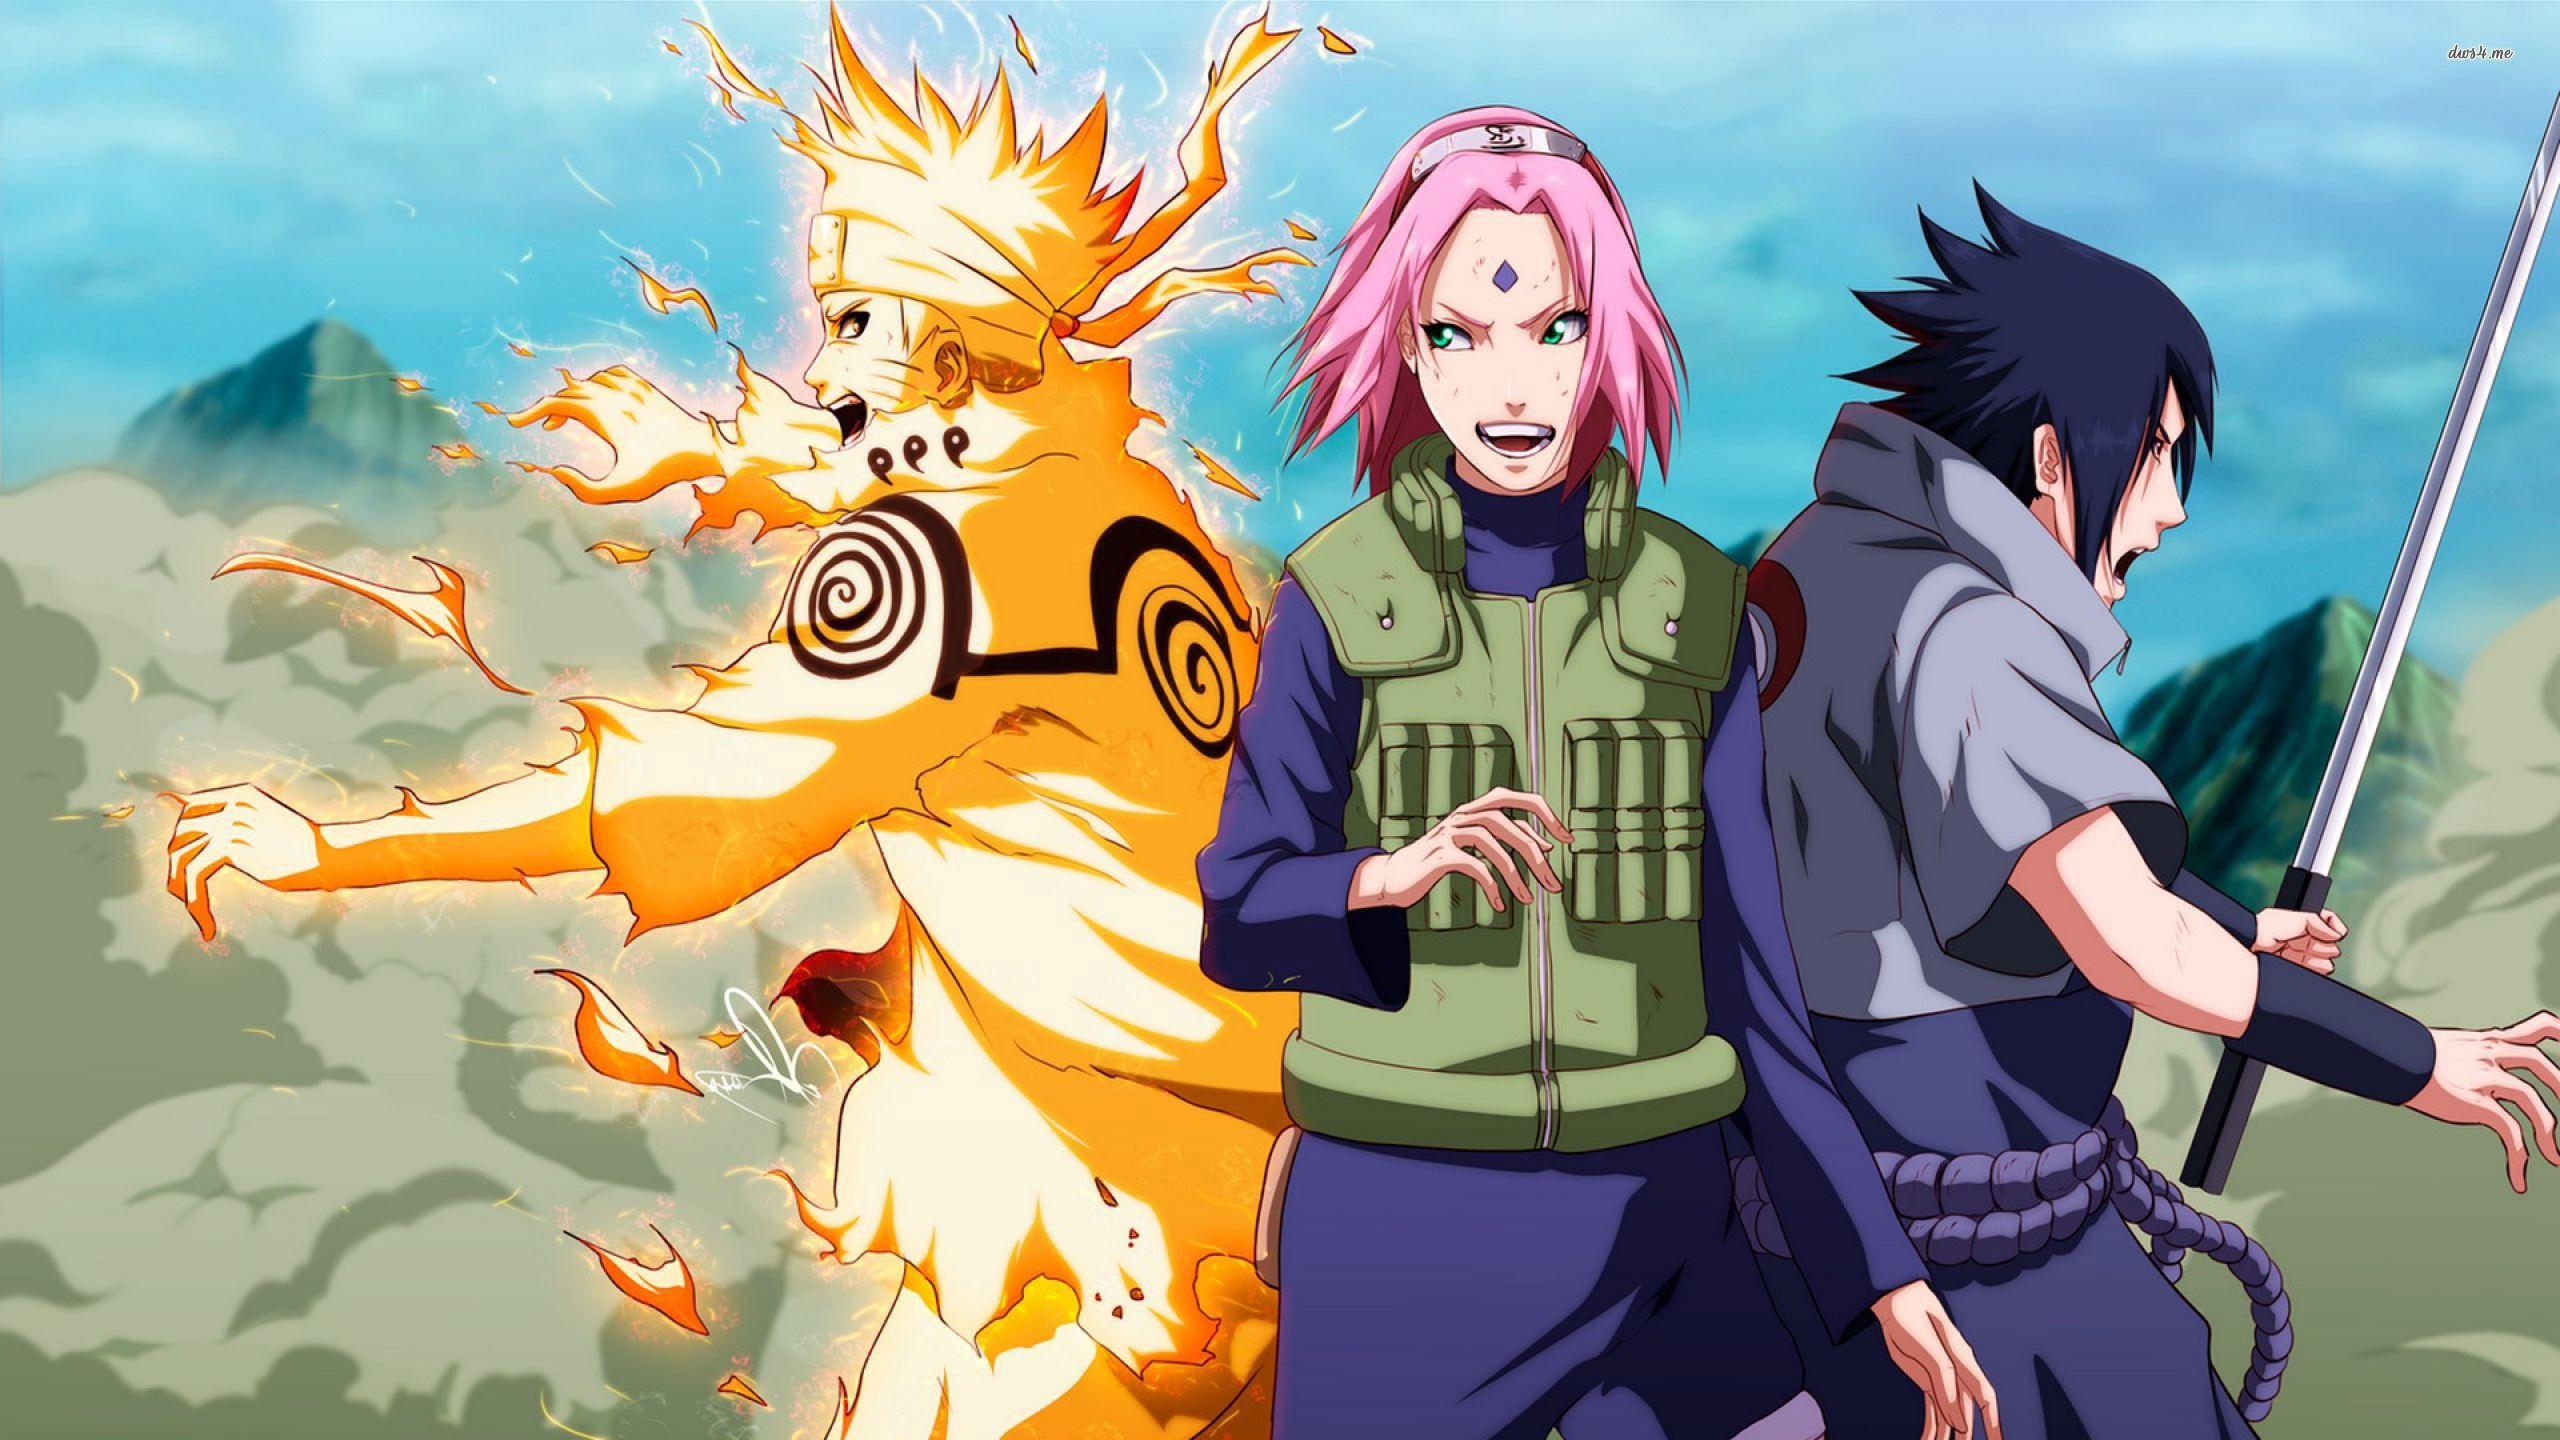 77 ] Naruto Shippuden Wallpaper For Desktop On WallpaperSafari